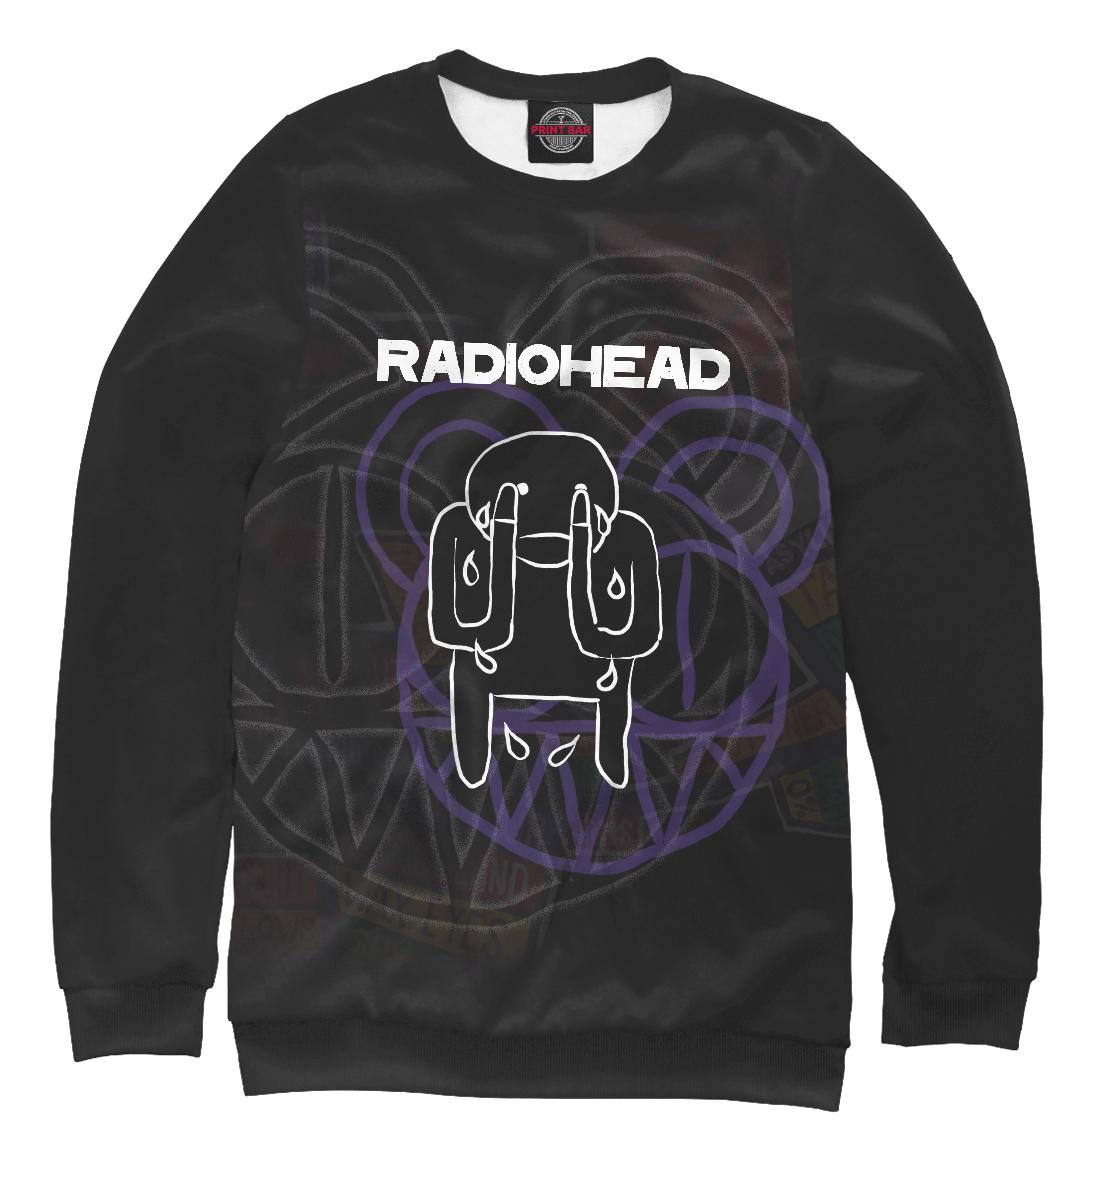 Купить Radiohead, Printbar, Свитшоты, RDH-334720-swi-2